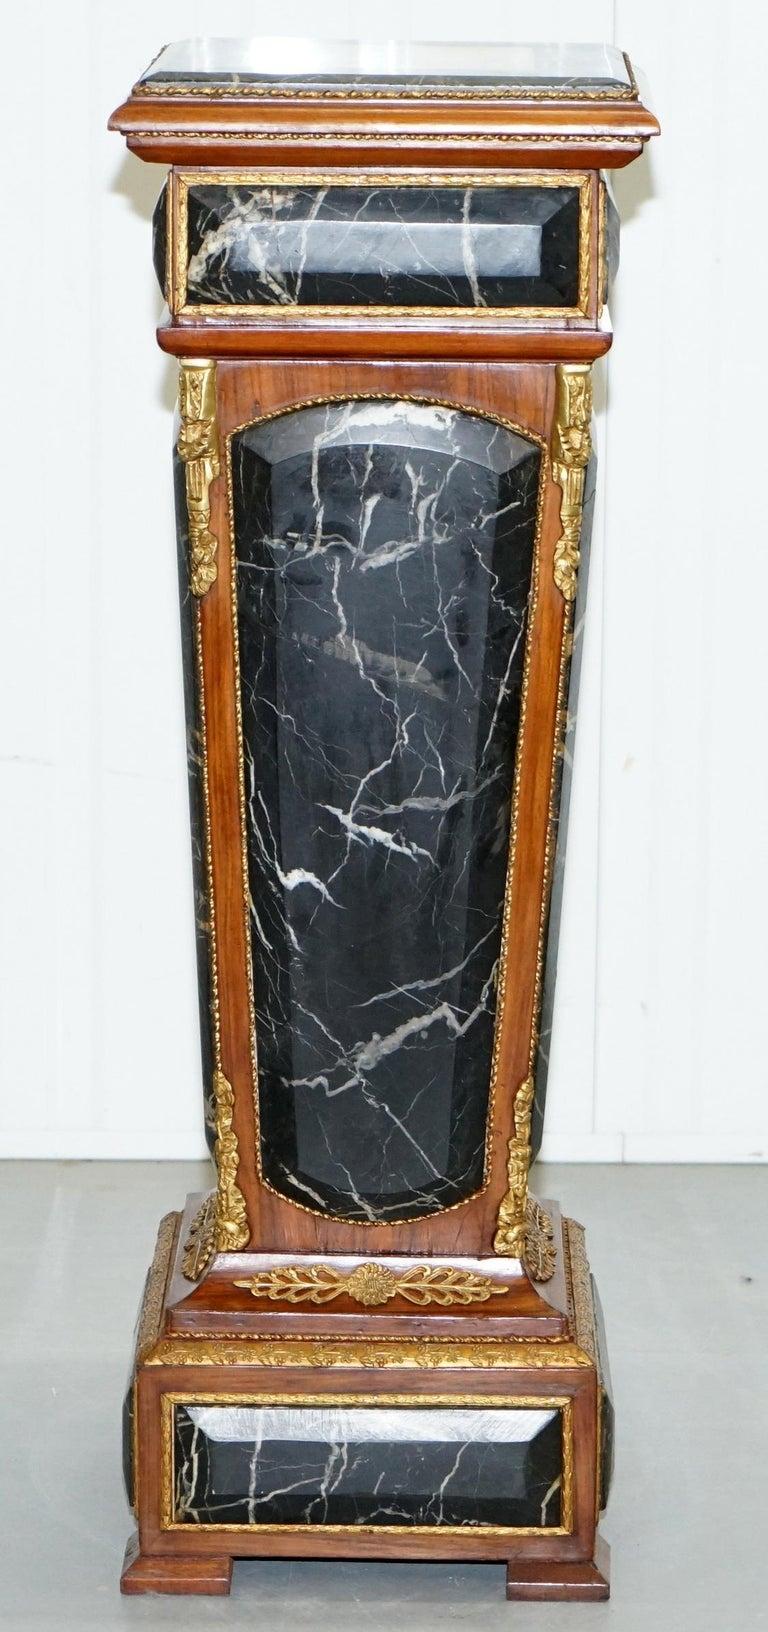 Pair of French Empire Marble, Kingwood & Ormolu Mounts Pedestal Columns Pillars For Sale 4